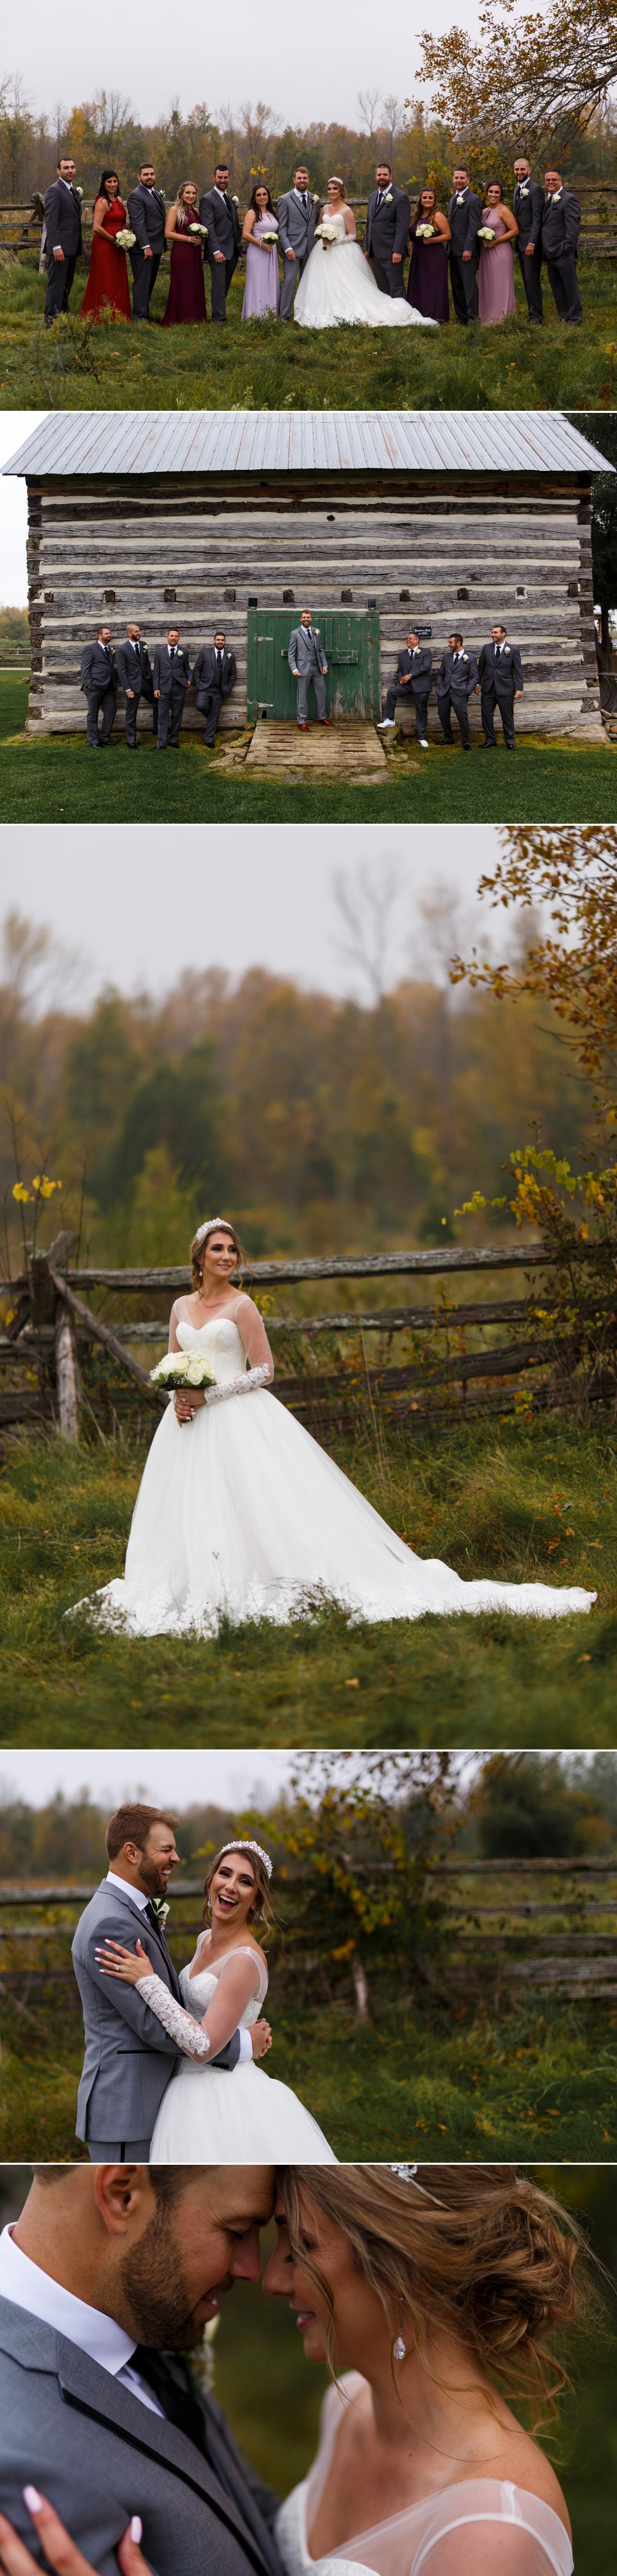 bridal portraits and wedding party portraits